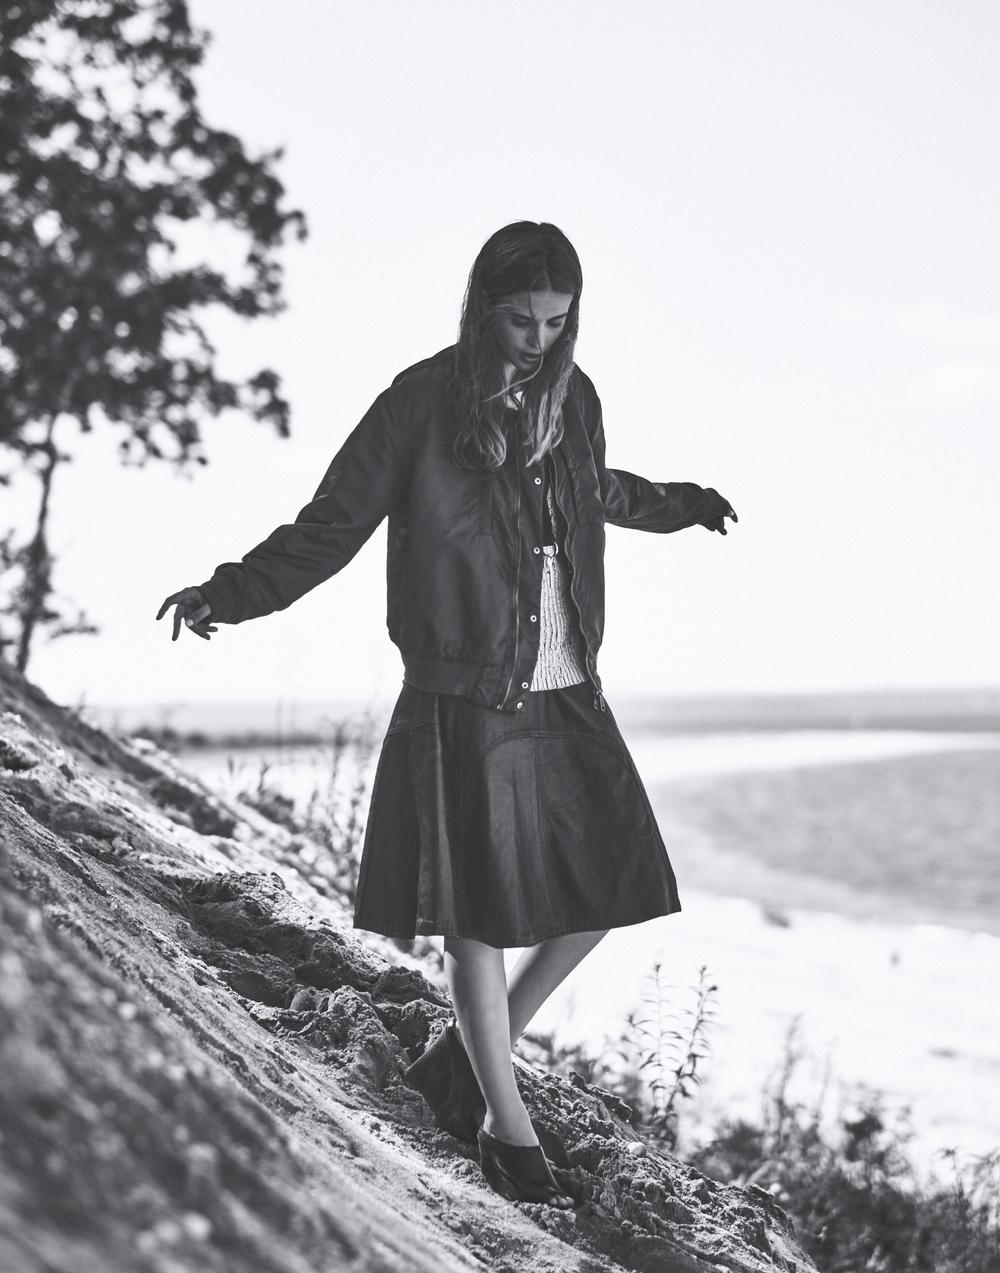 03 Polina by Geoff Barrenger - Shot 4.jpg